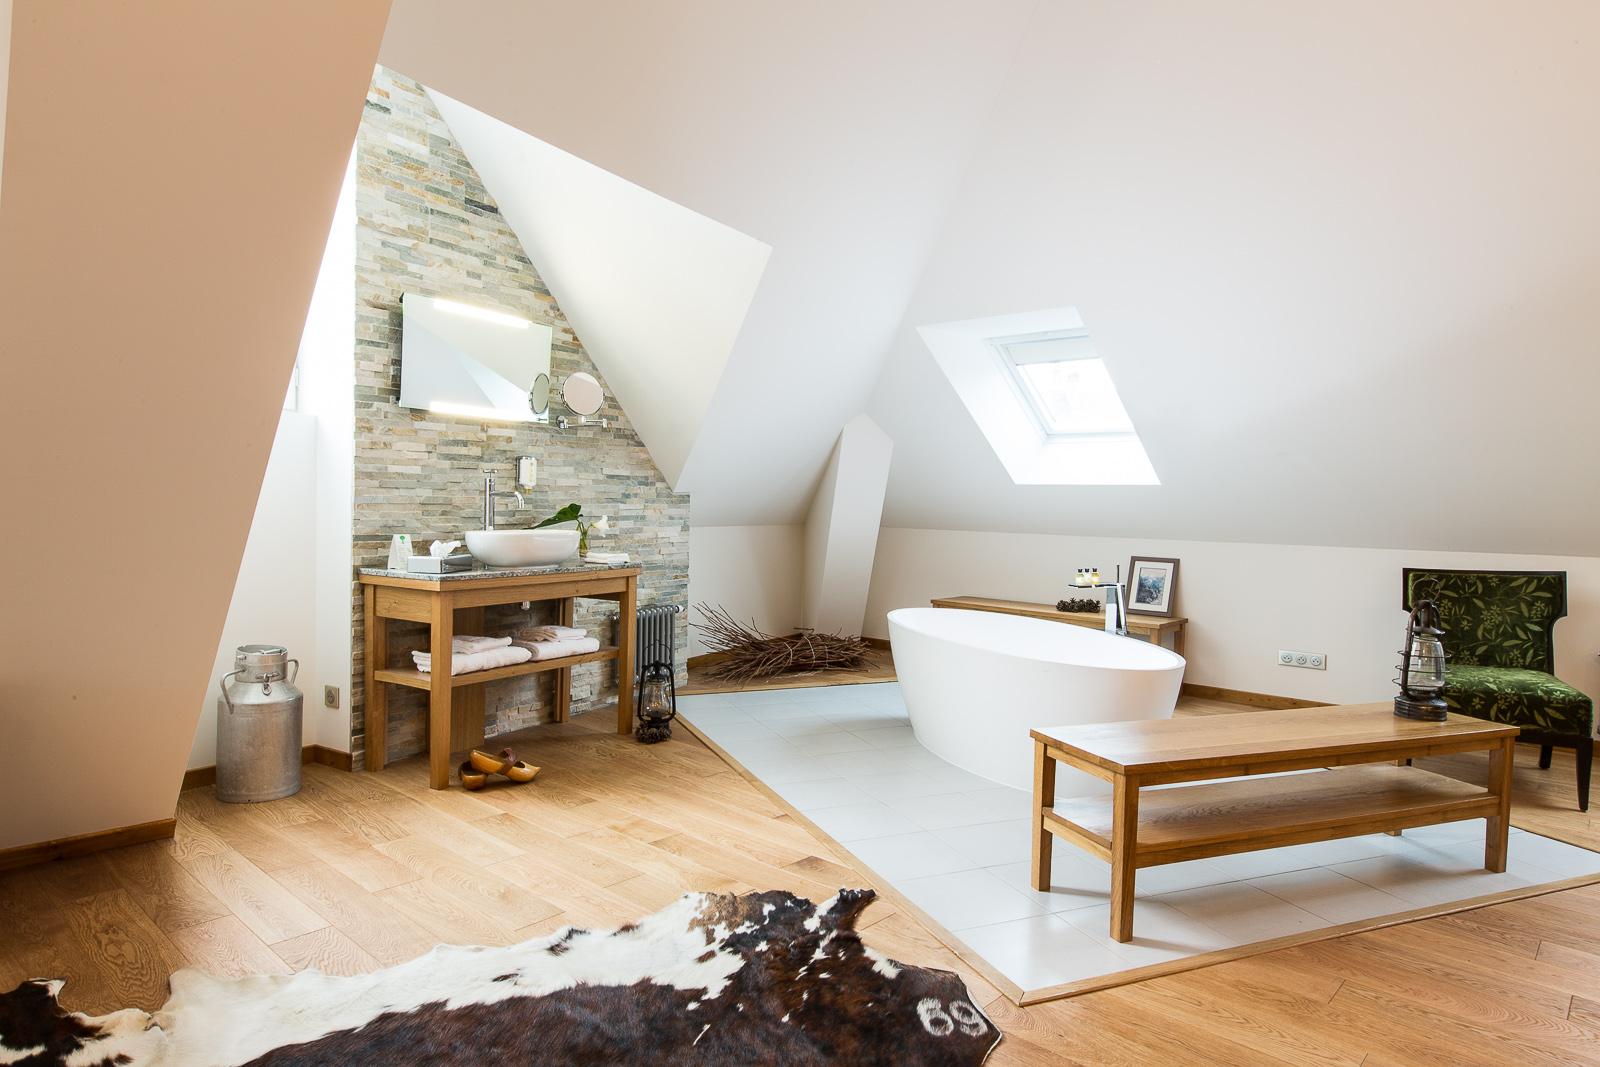 Hotel Marotte chalet salle de bain